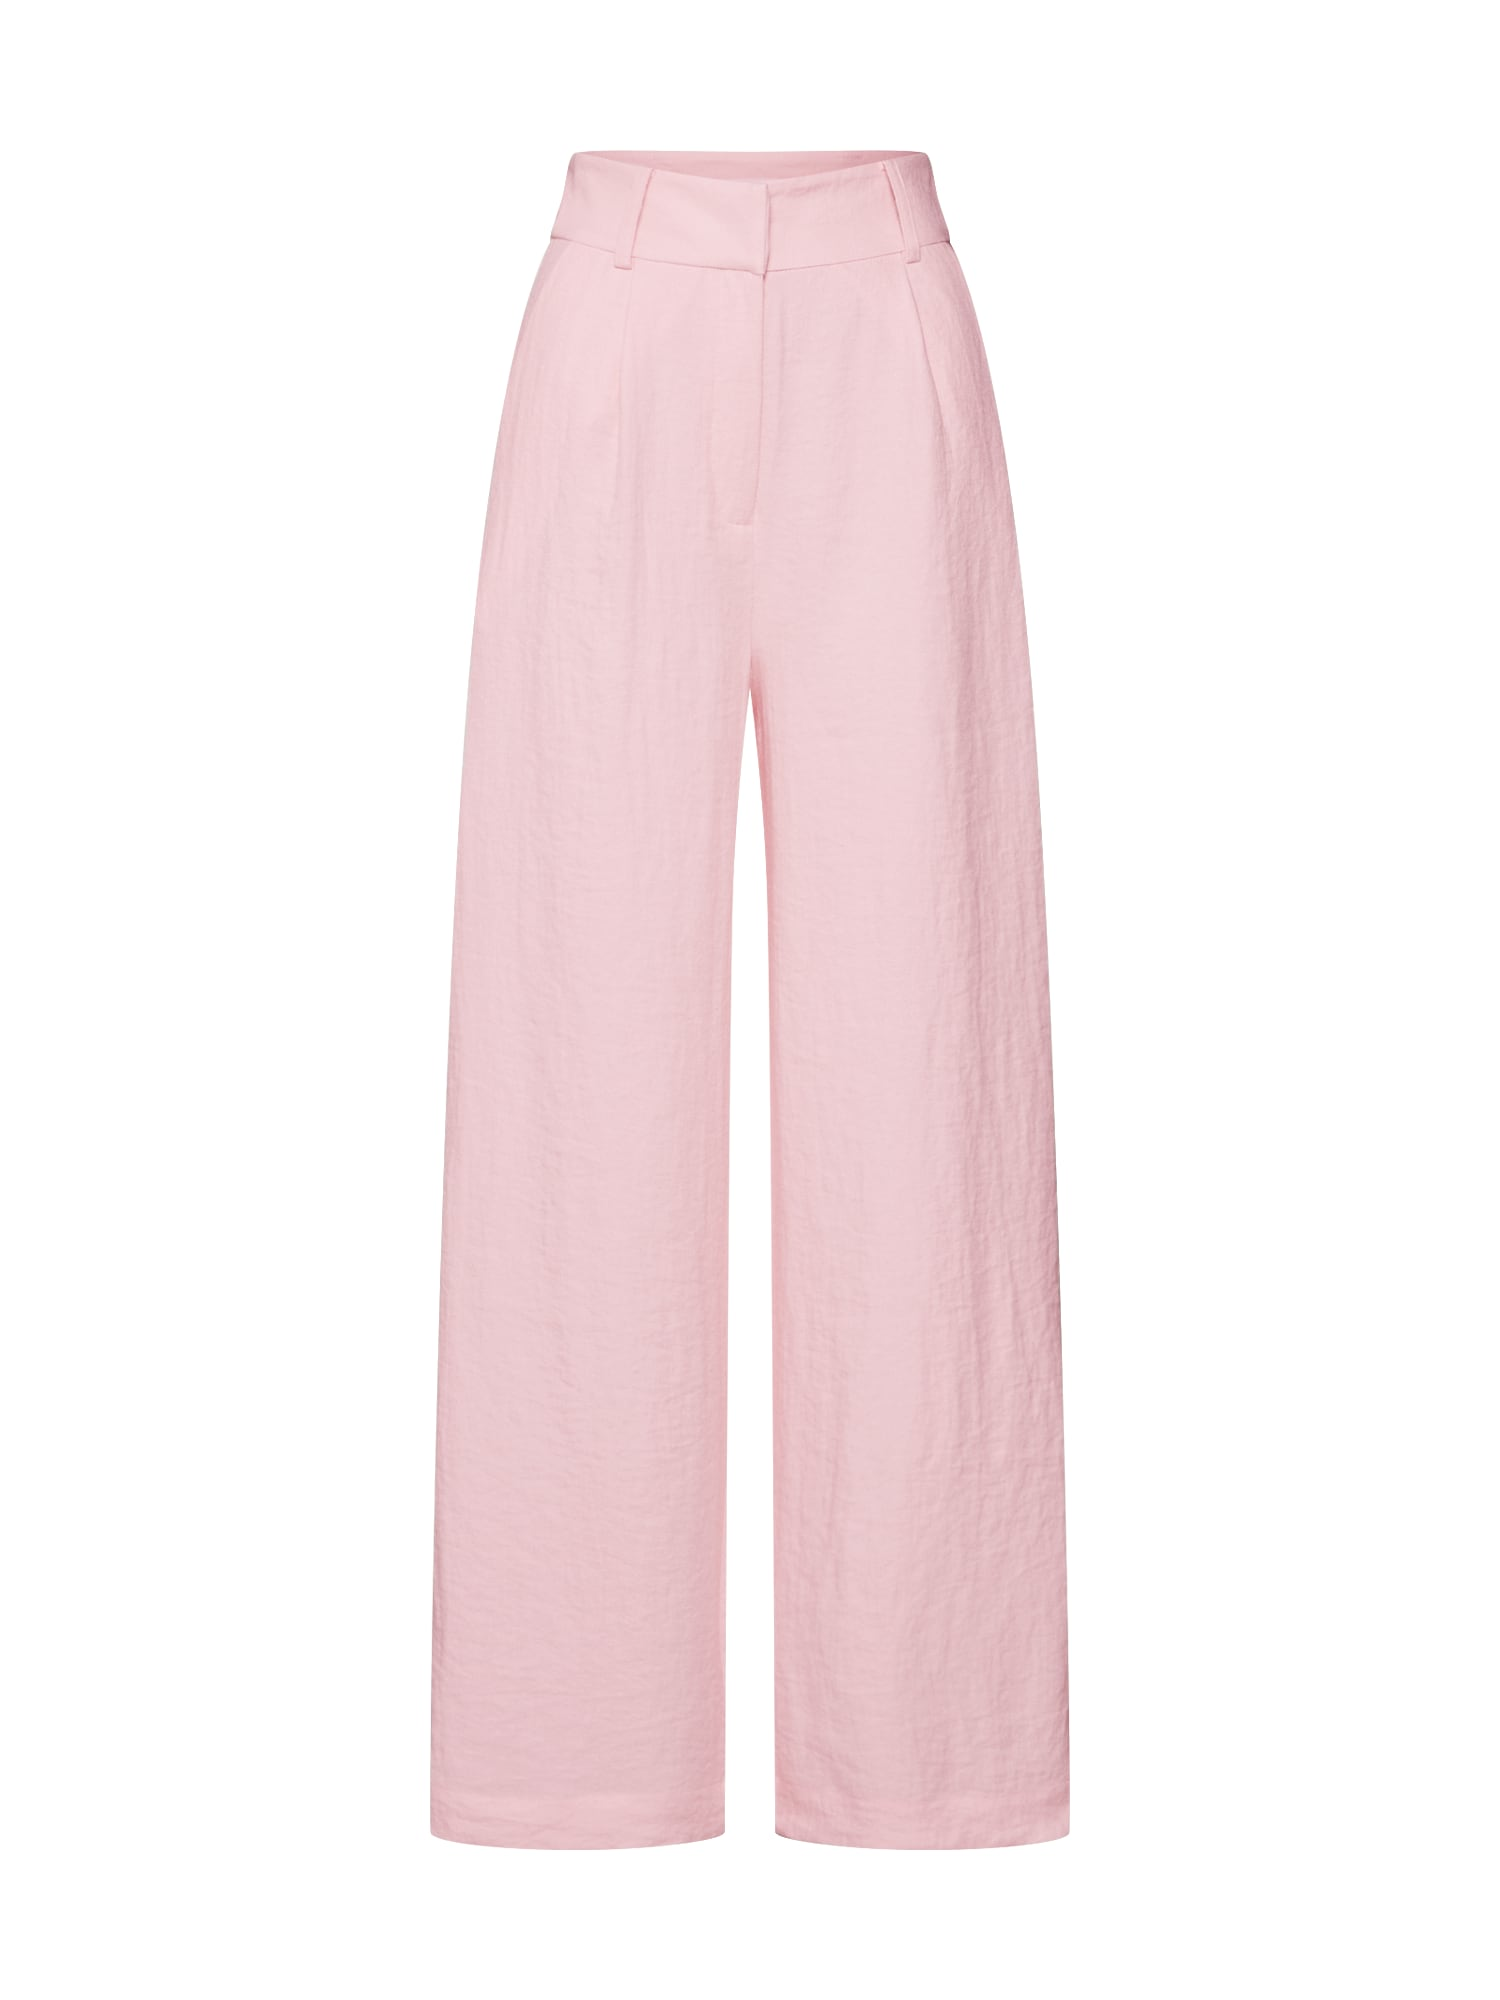 Kalhoty se sklady v pase Juna pink EDITED